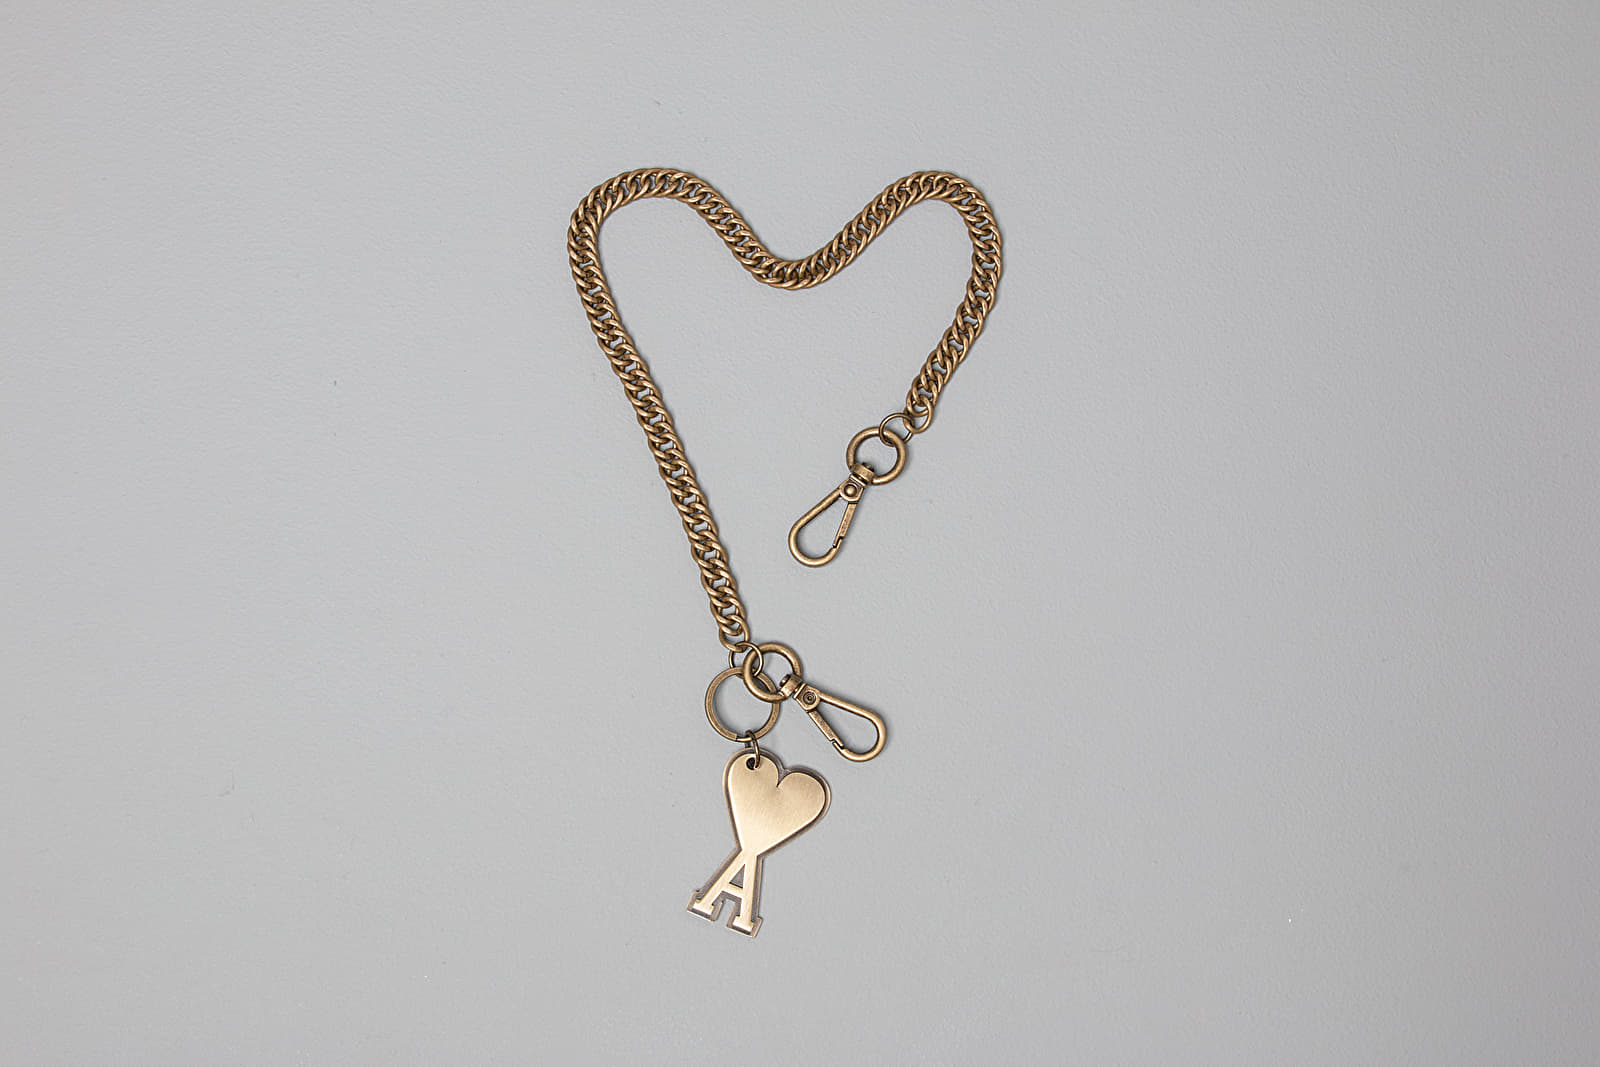 AMI Alexandre Mattiussi Chain De Coeur Key Ring And Chain